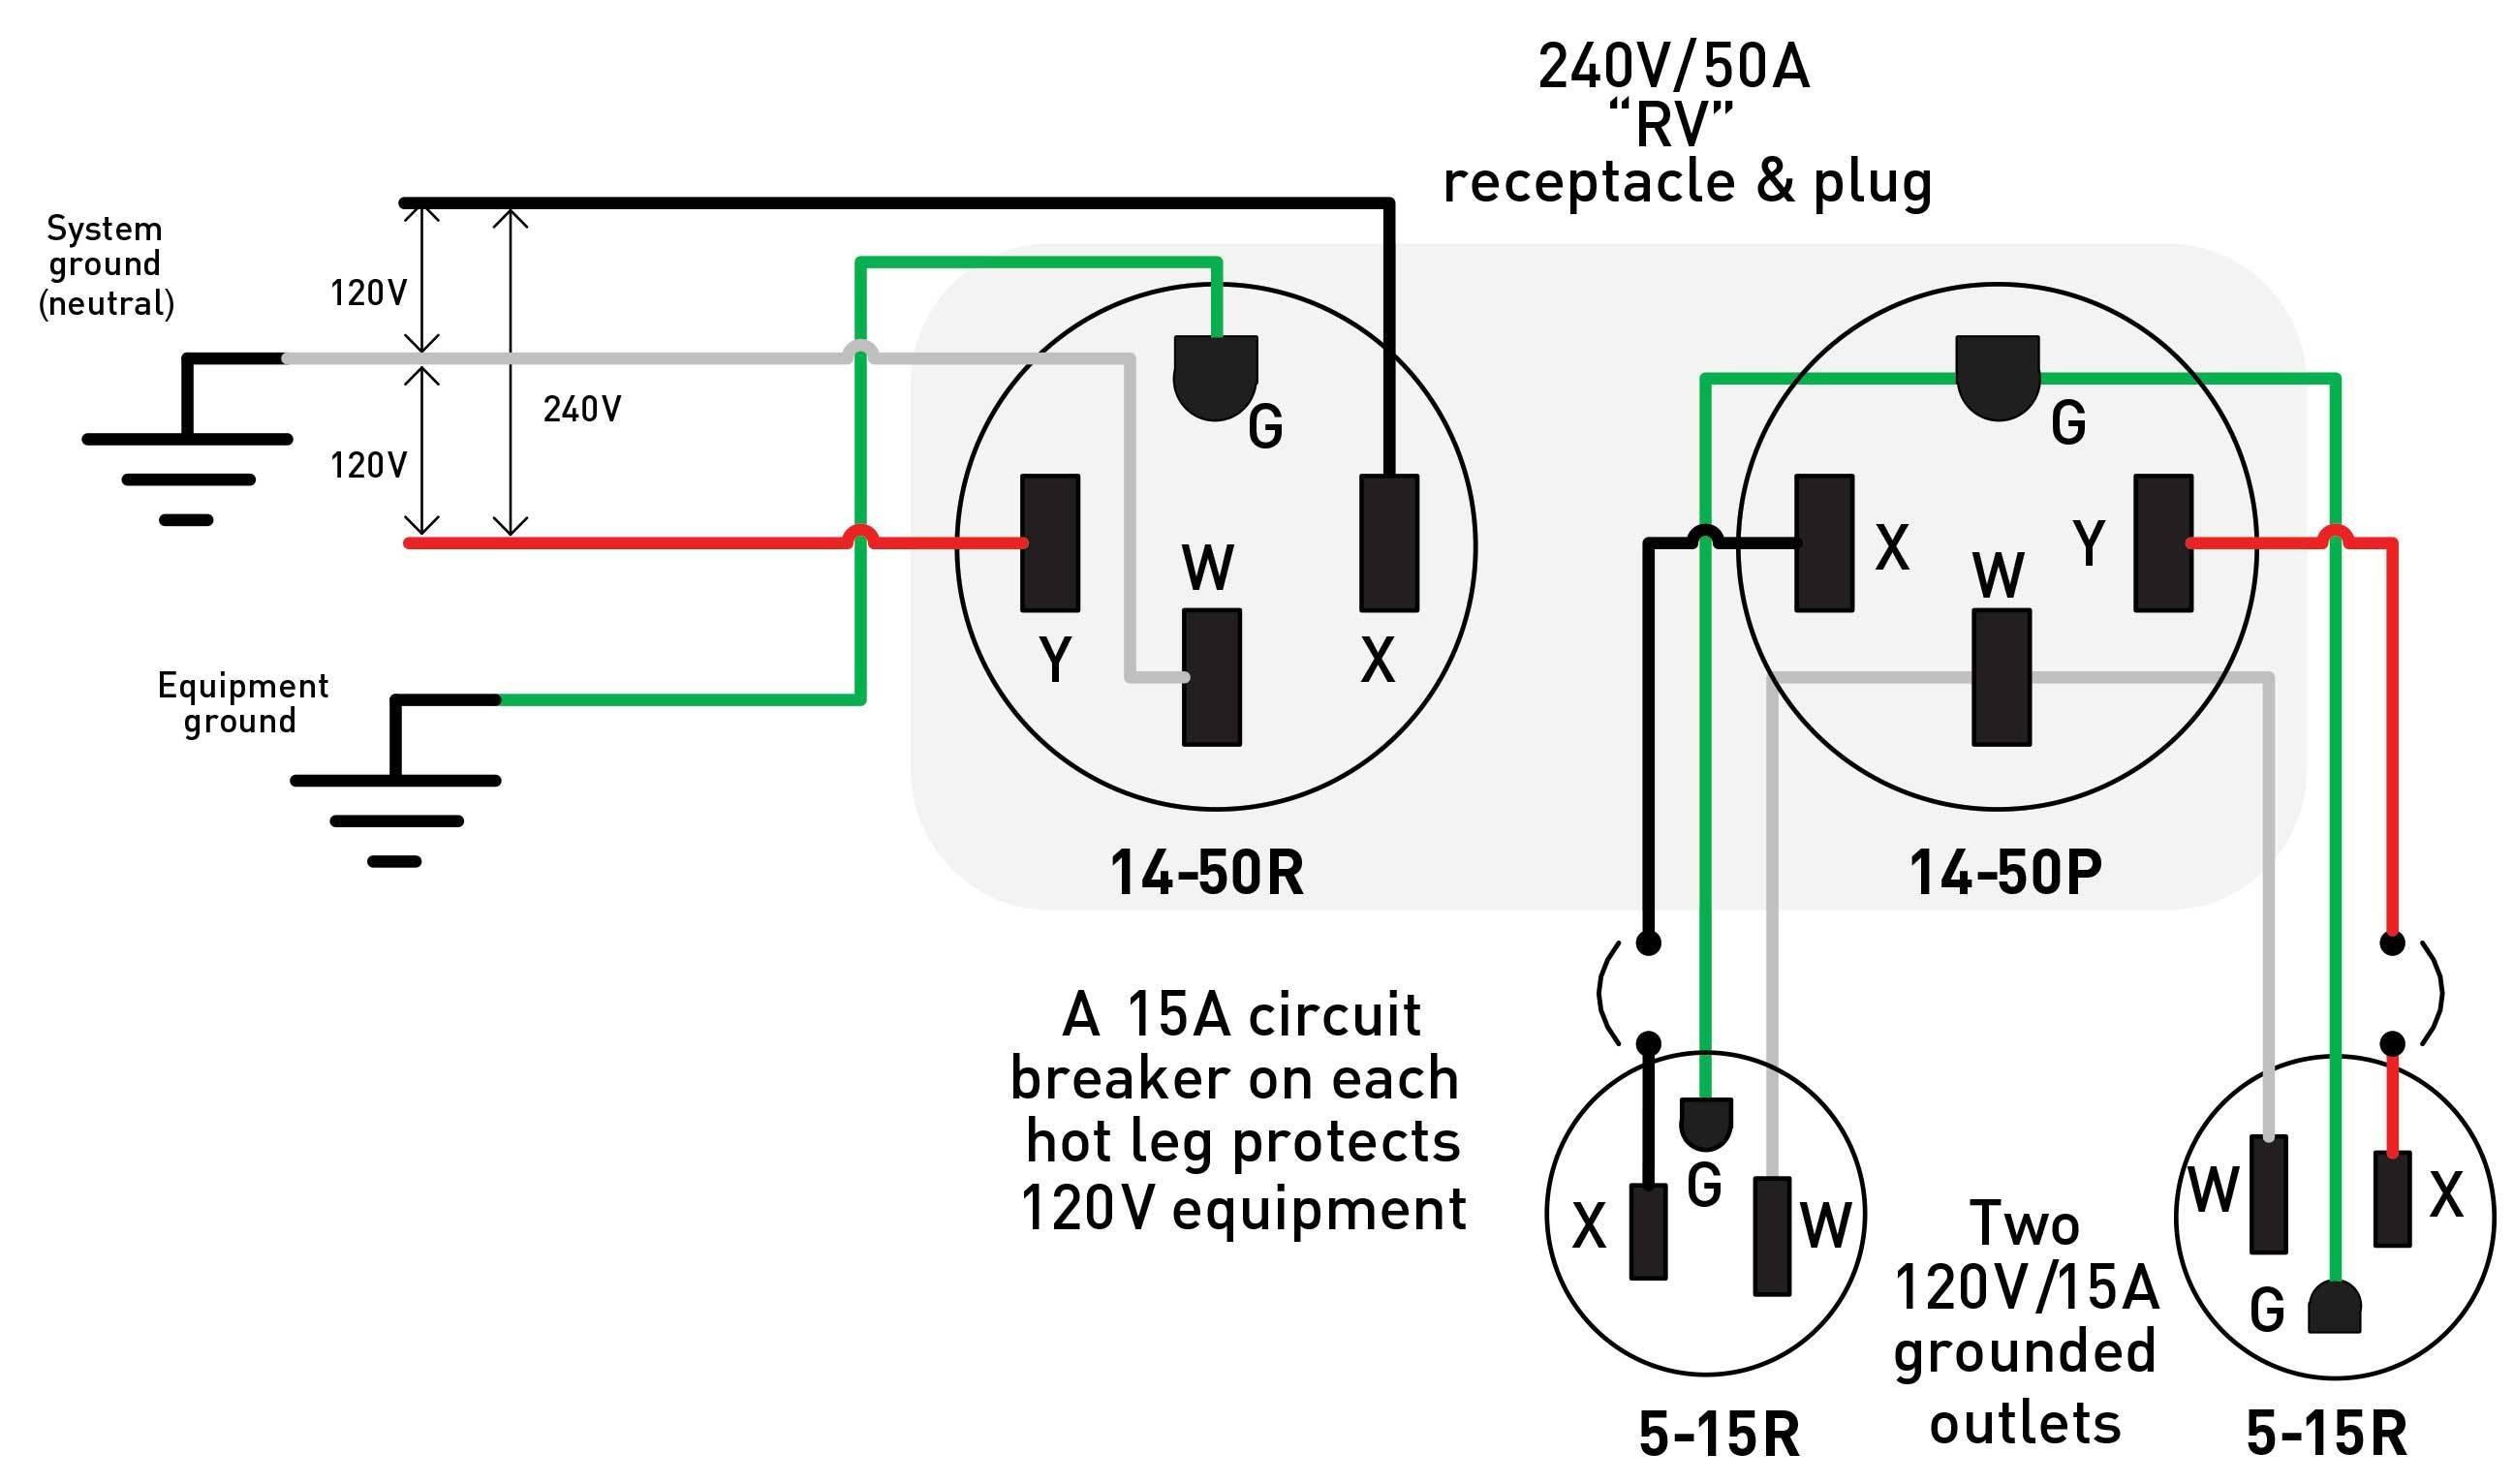 220V Wiring Diagram - Wiring Diagrams Hubs - 220V Wiring Diagram